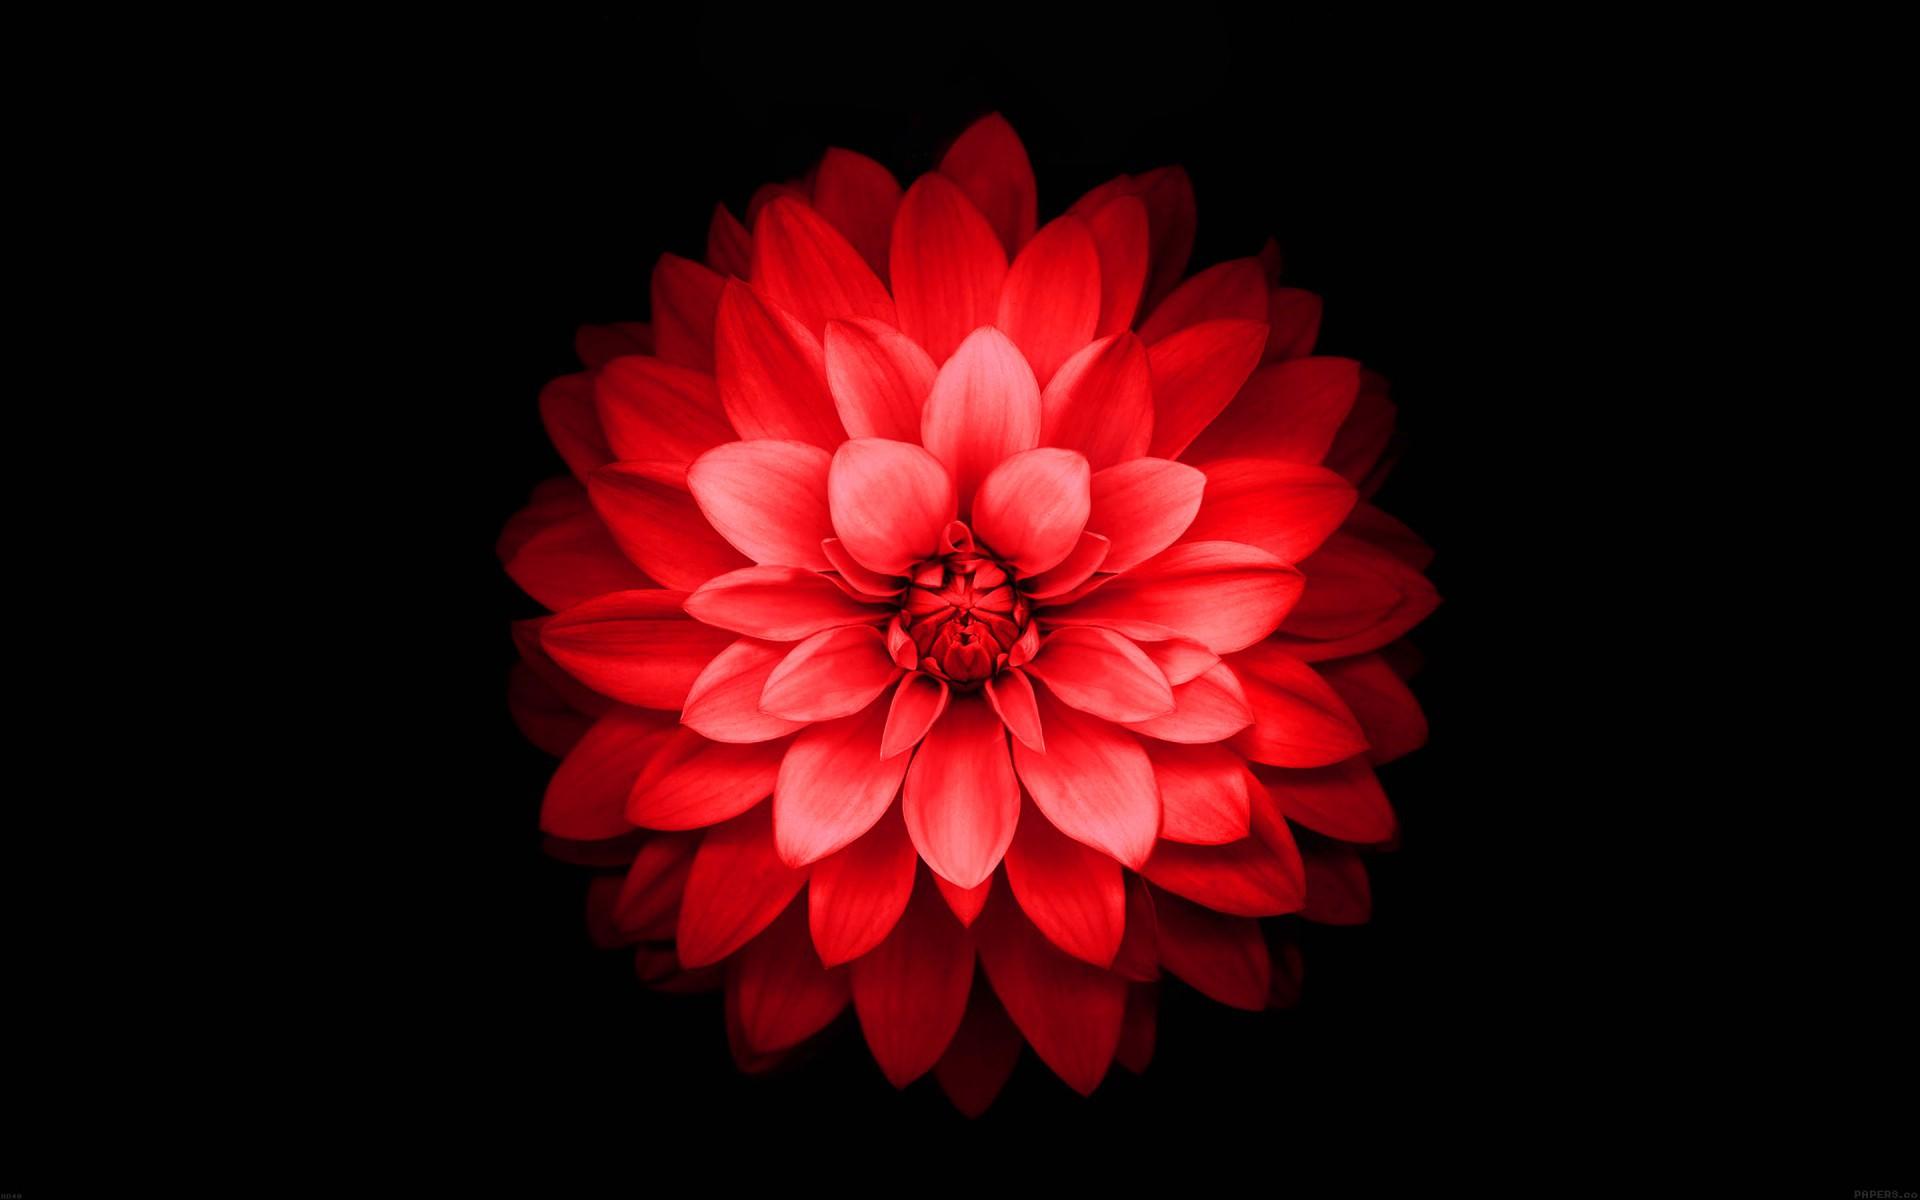 Iphone 6 Plus Red Lotus Flower Retina Wallpaper - Iphone Red Flower Wallpaper Hd , HD Wallpaper & Backgrounds